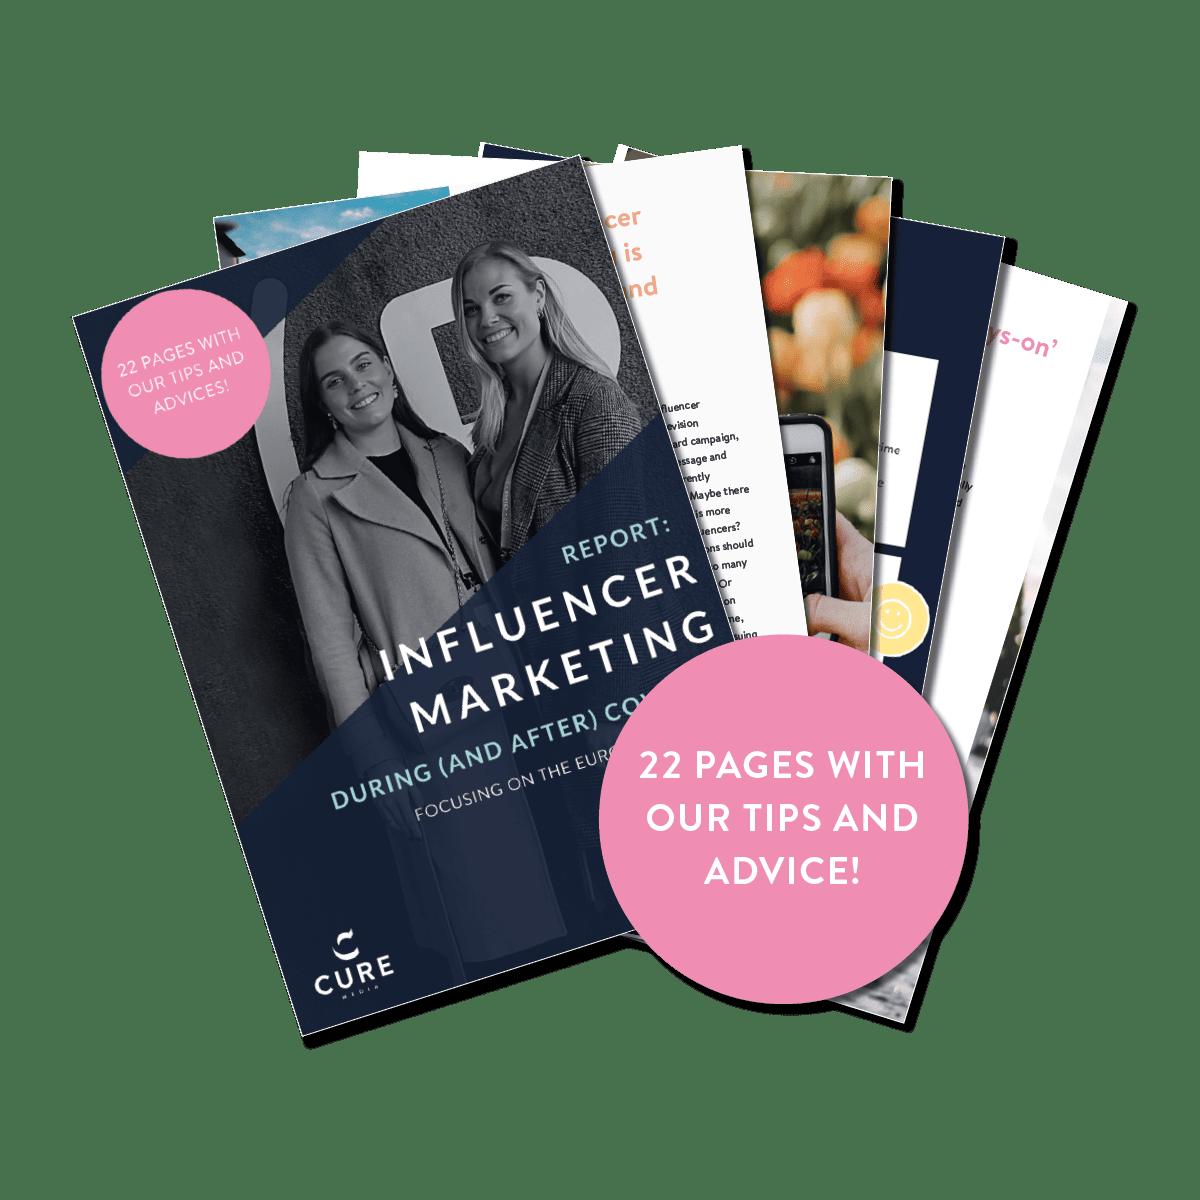 Report: Influencer Marketing under Covid-19